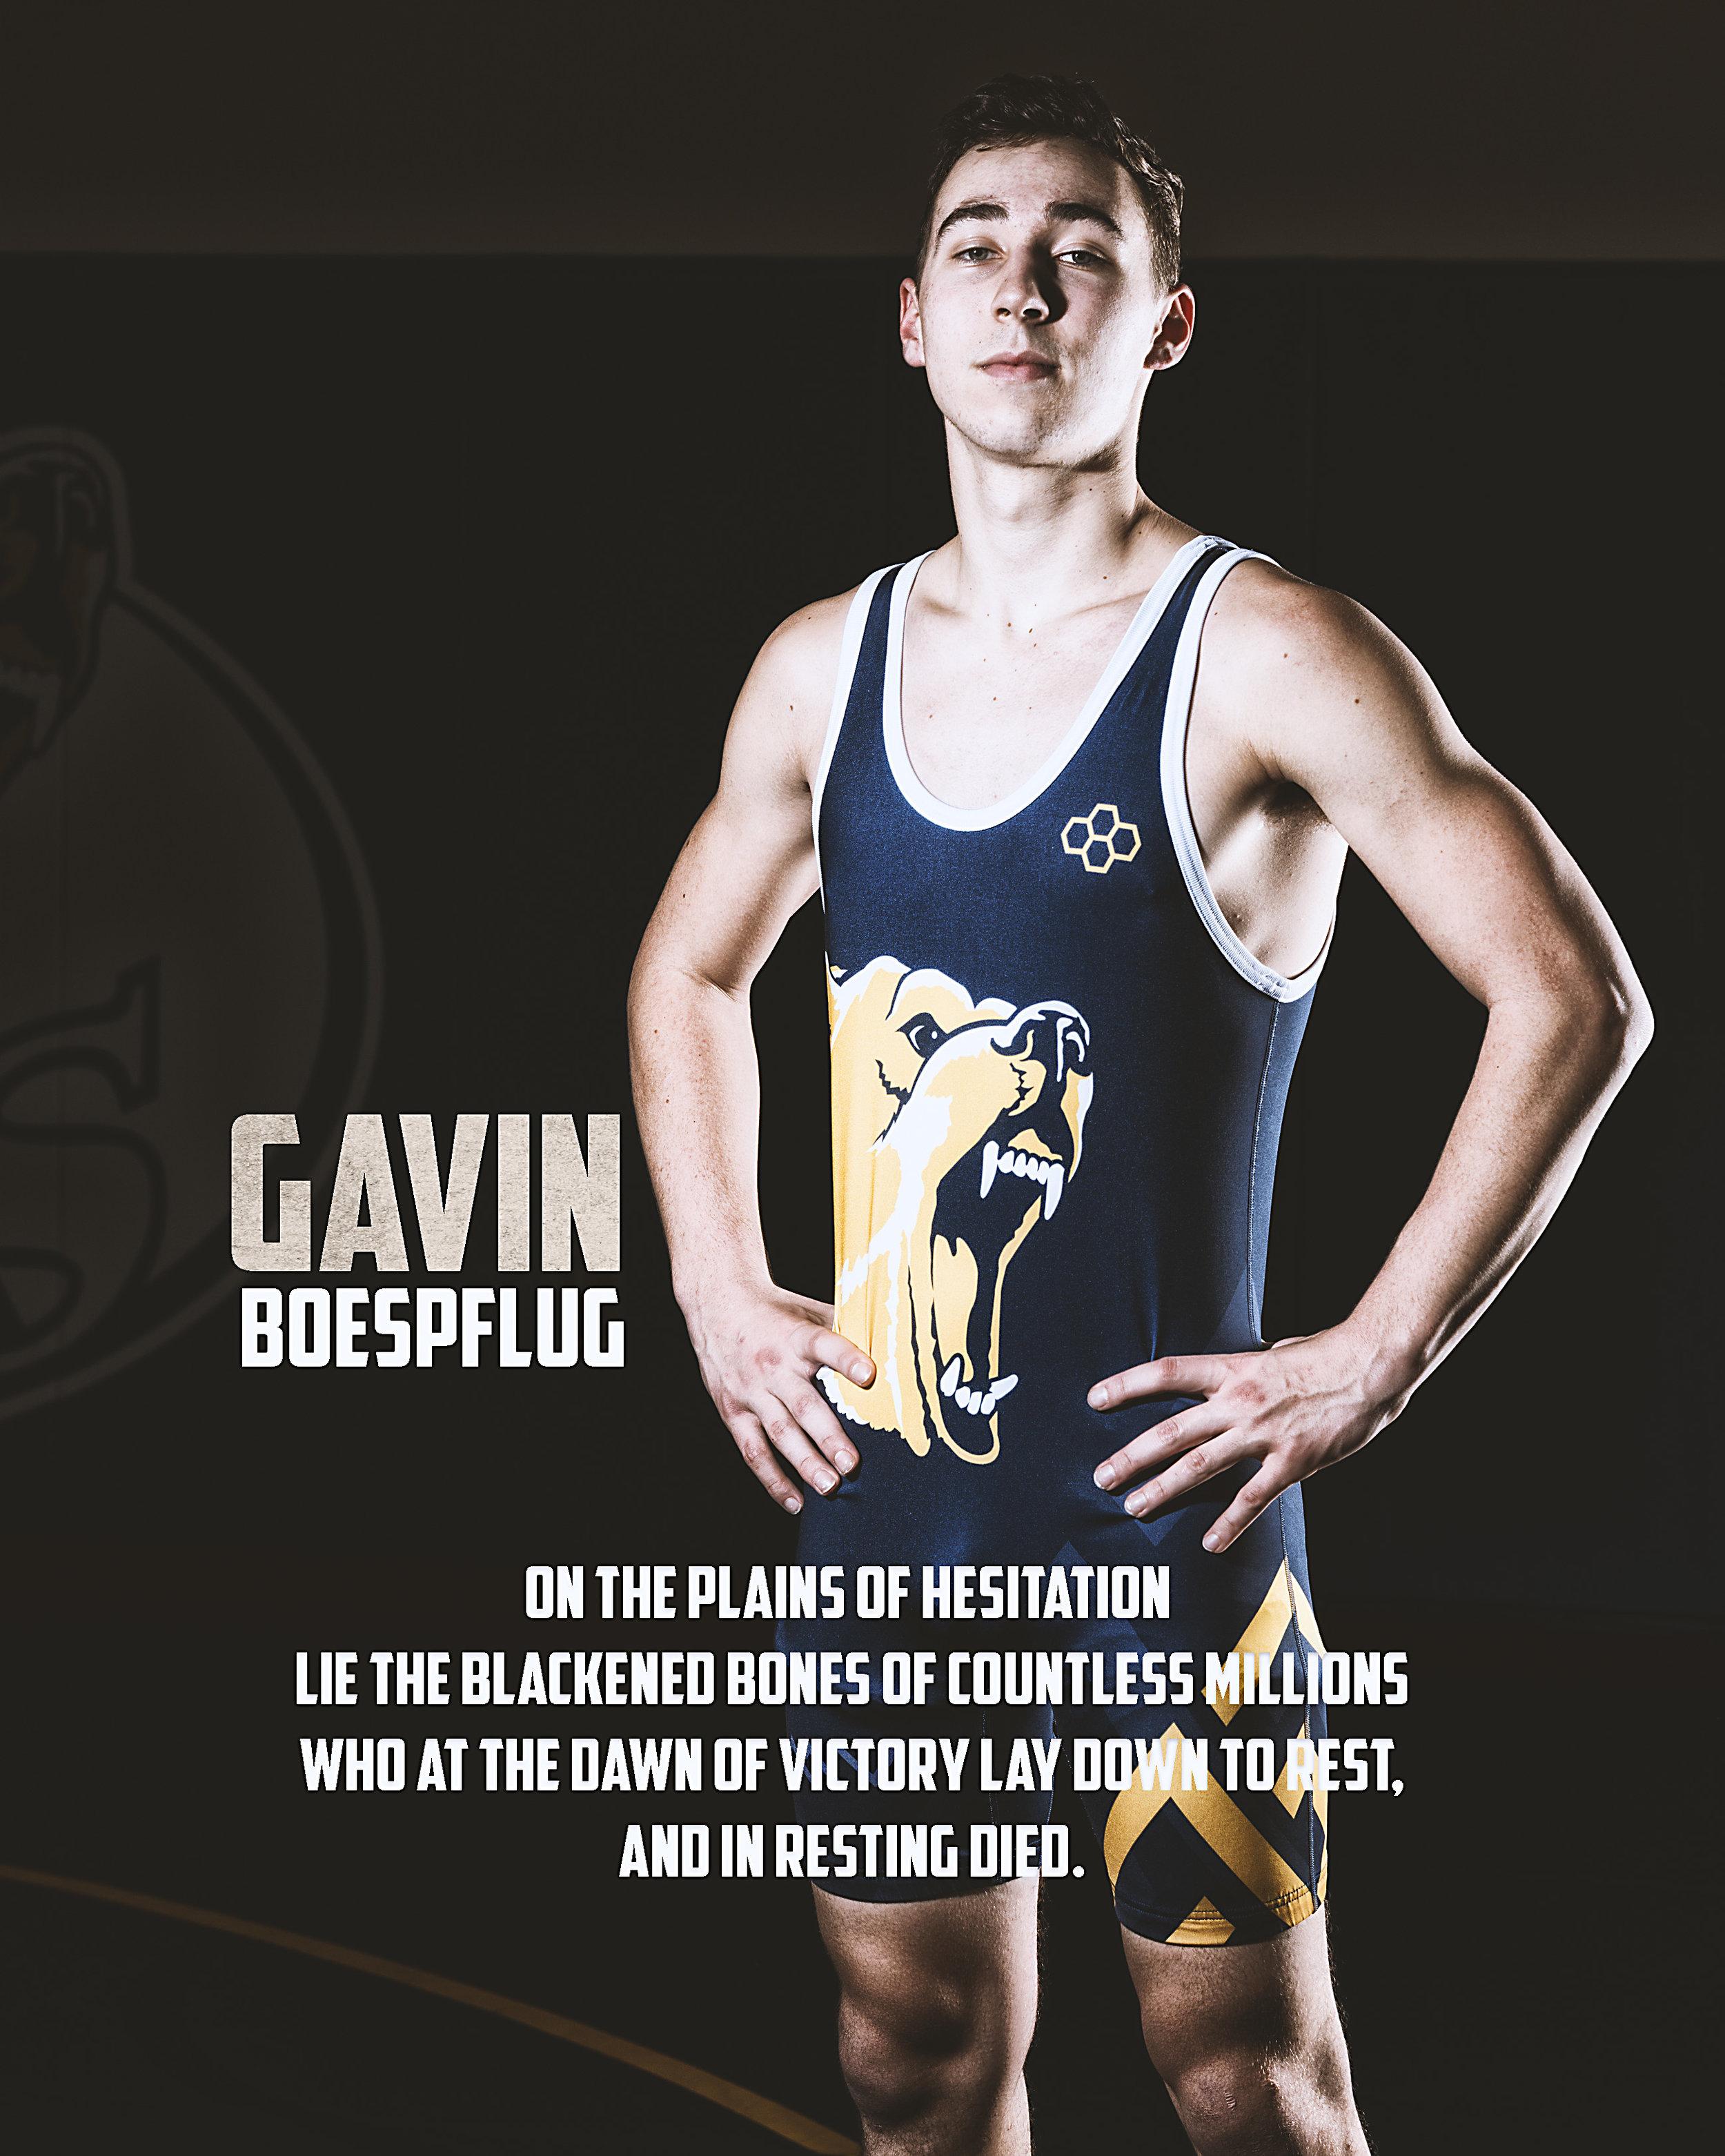 Gavin.jpg